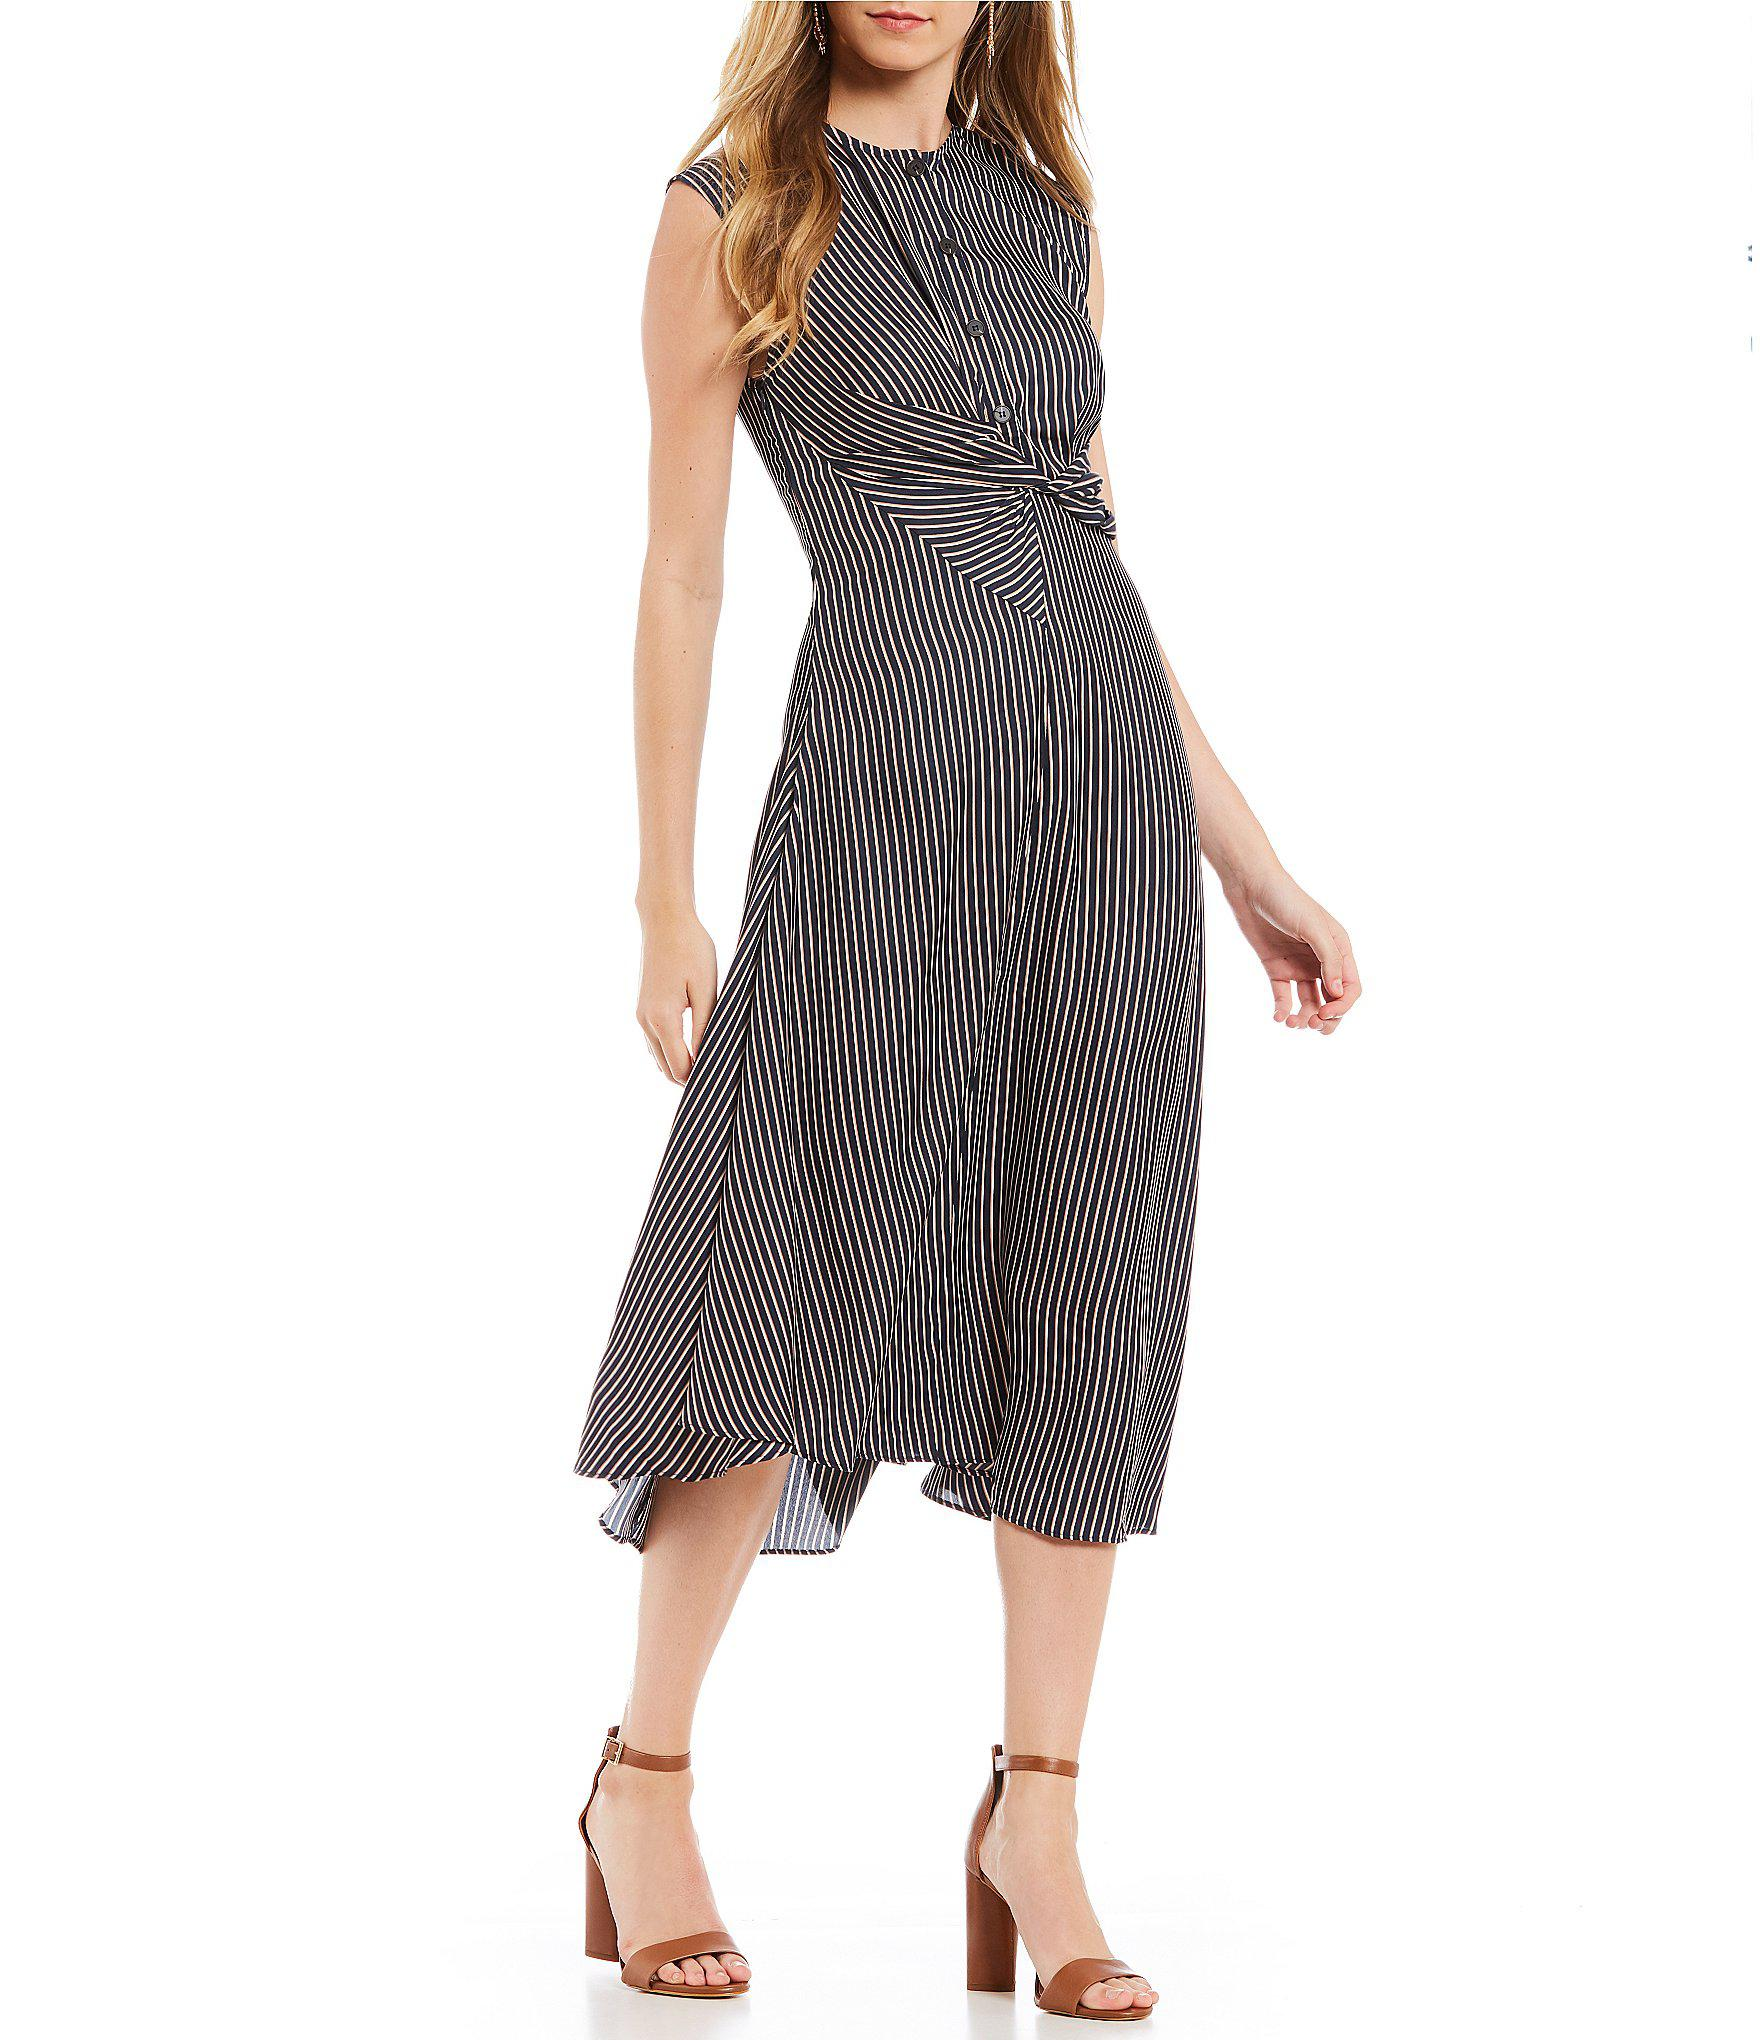 98ebb171a2 Gianni Bini Alex Twist Button Front Stripe Midi Dress - Lyst